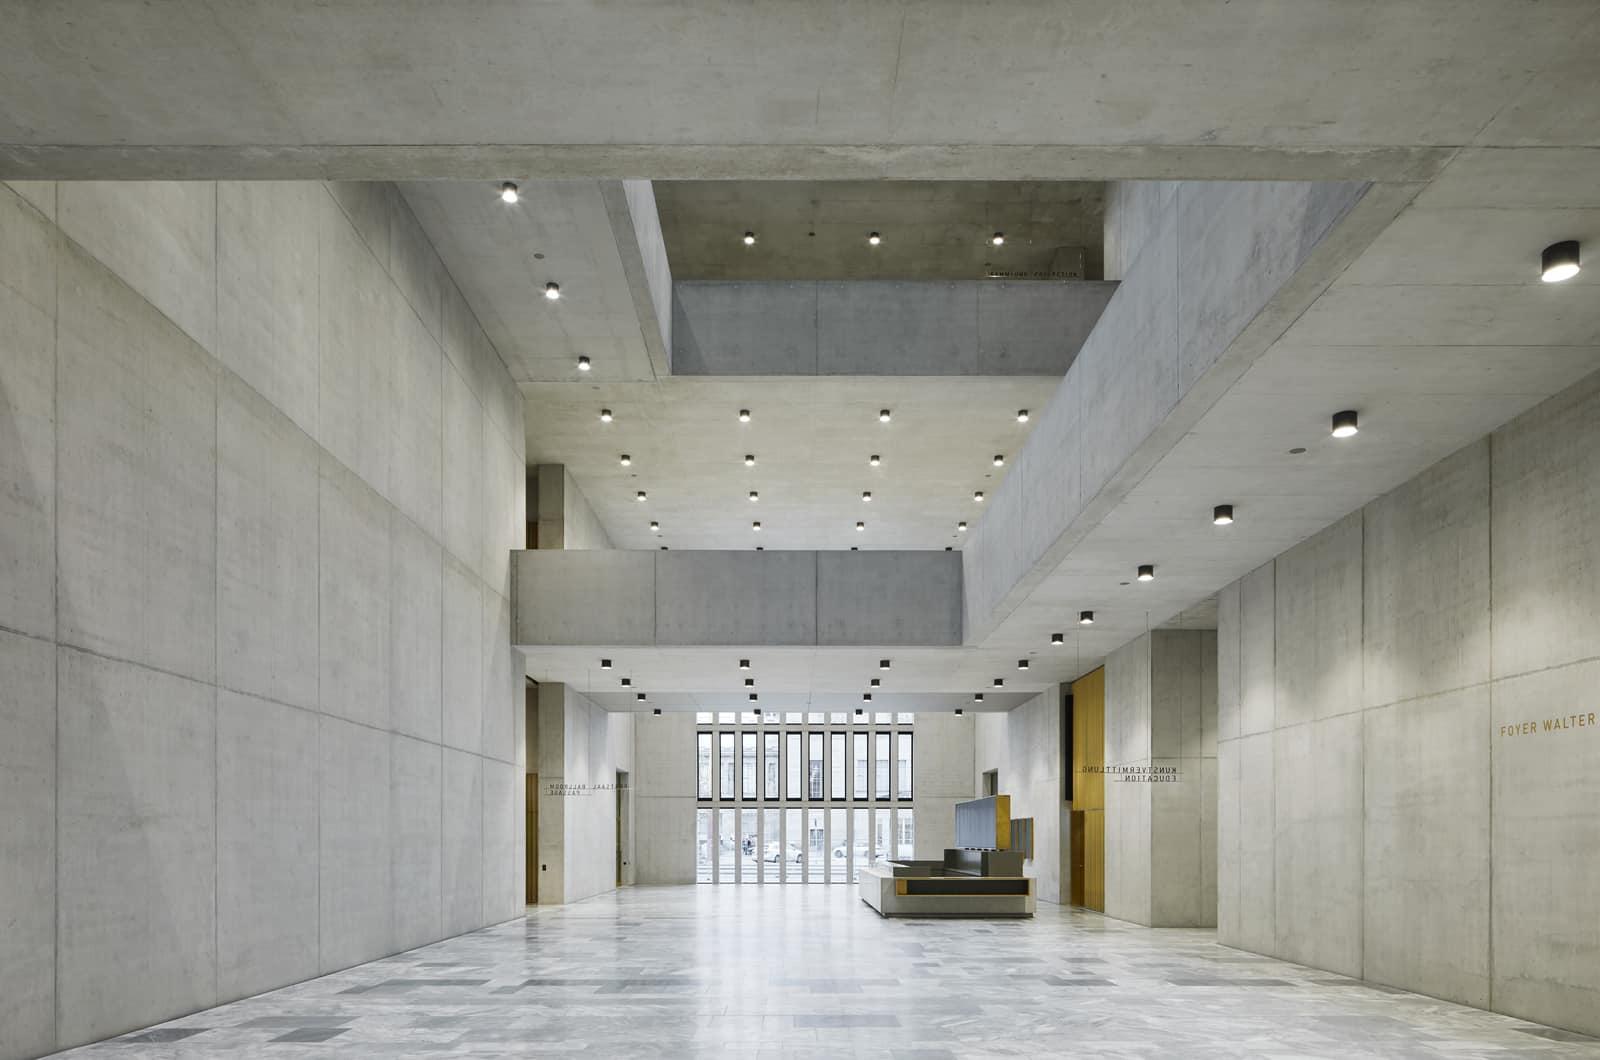 Kunsthaus Zürich  - 20210712 Chipperfield Kunsthaus 03 35